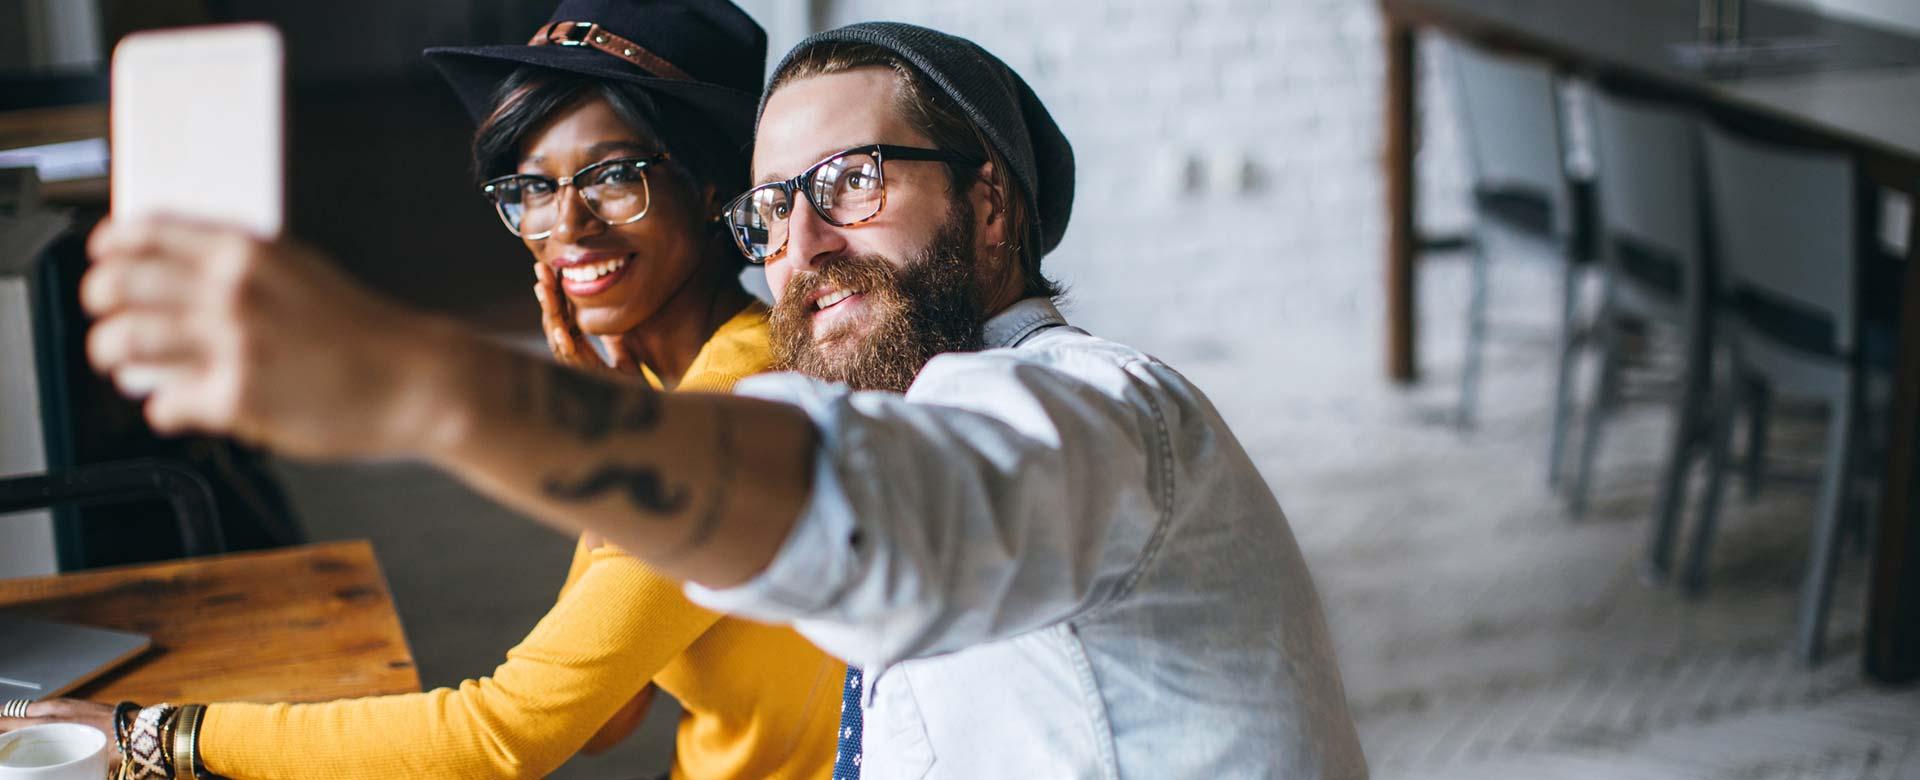 stylish sunglasses couple taking selfie